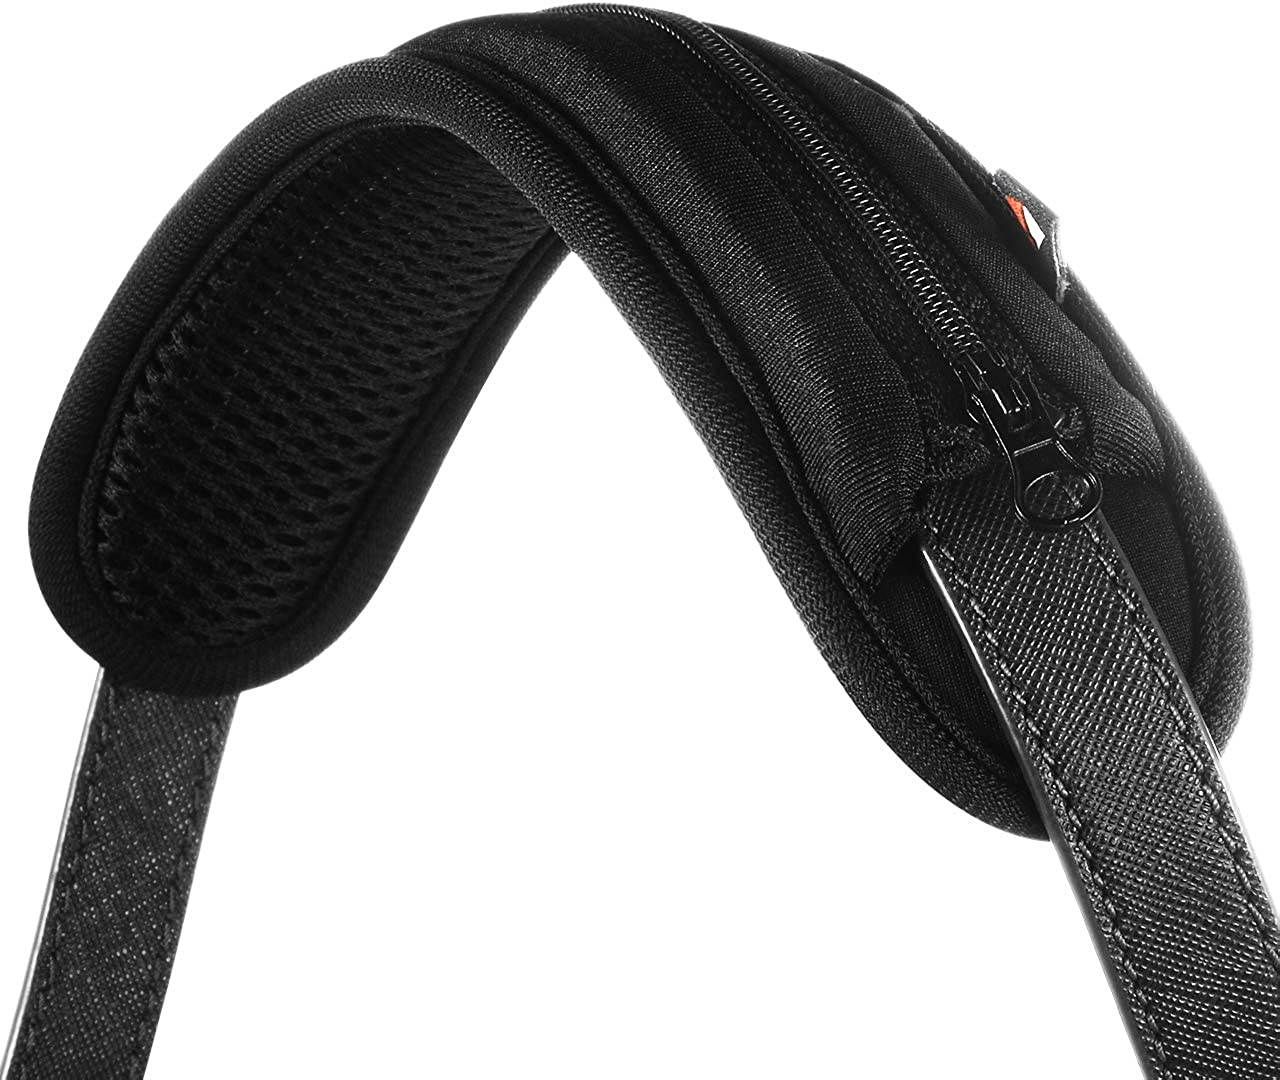 TXEsign Replacement Shoulder Pad Cushion Pads for Bags, Laptop Case Bag, Sling Bag Carrying Case, Messenger Shoulder Bag